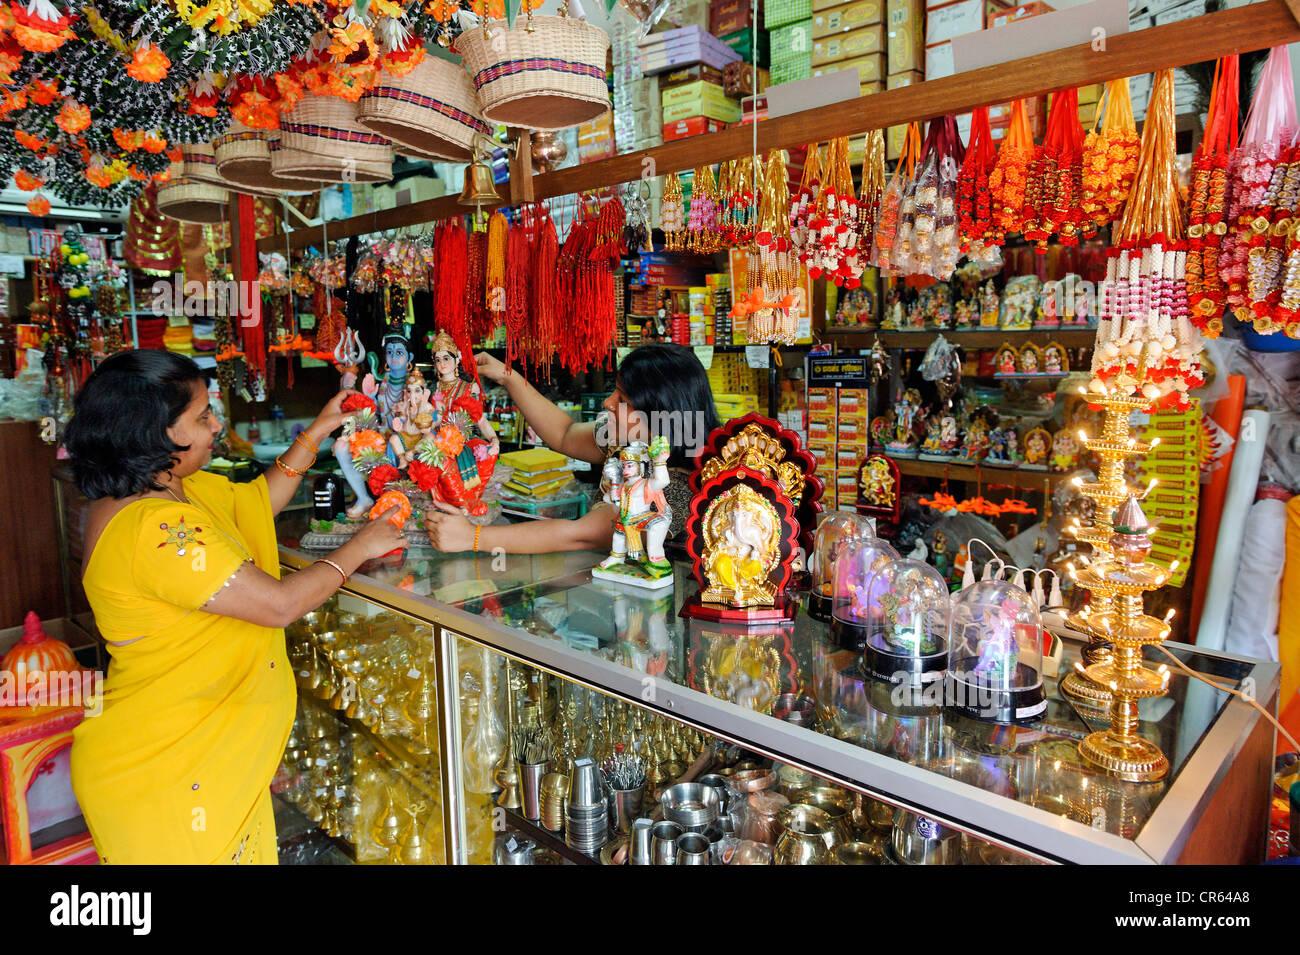 Mauritius, Pamplemousses District, Triolet, longest village of the island, Hindu religious items shop - Stock Image